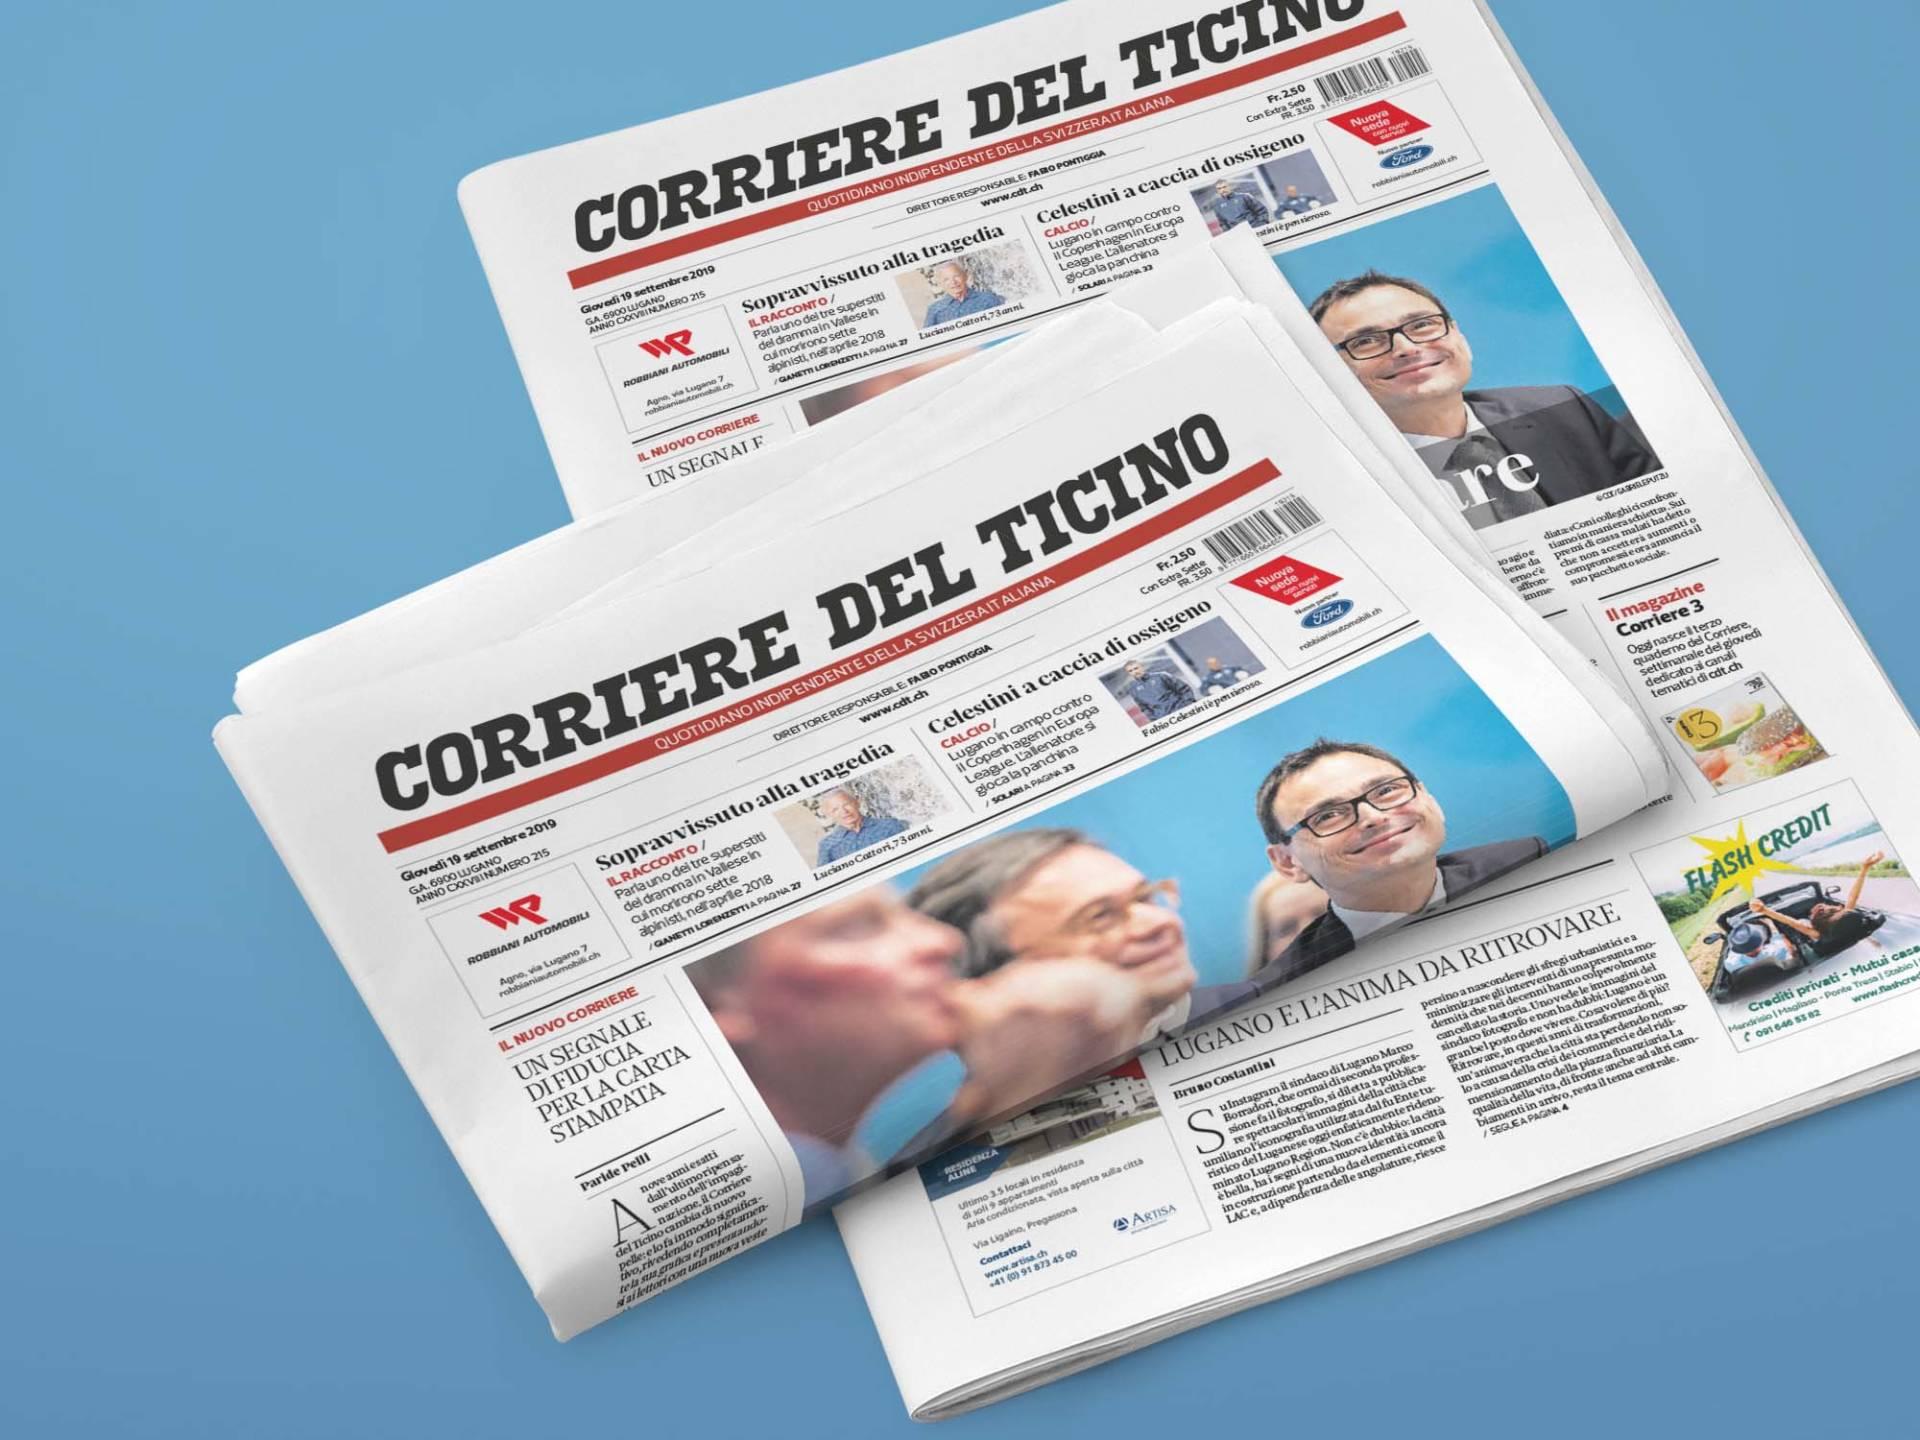 Corriere_Del_Ticino_01_Wenceslau_News_Design